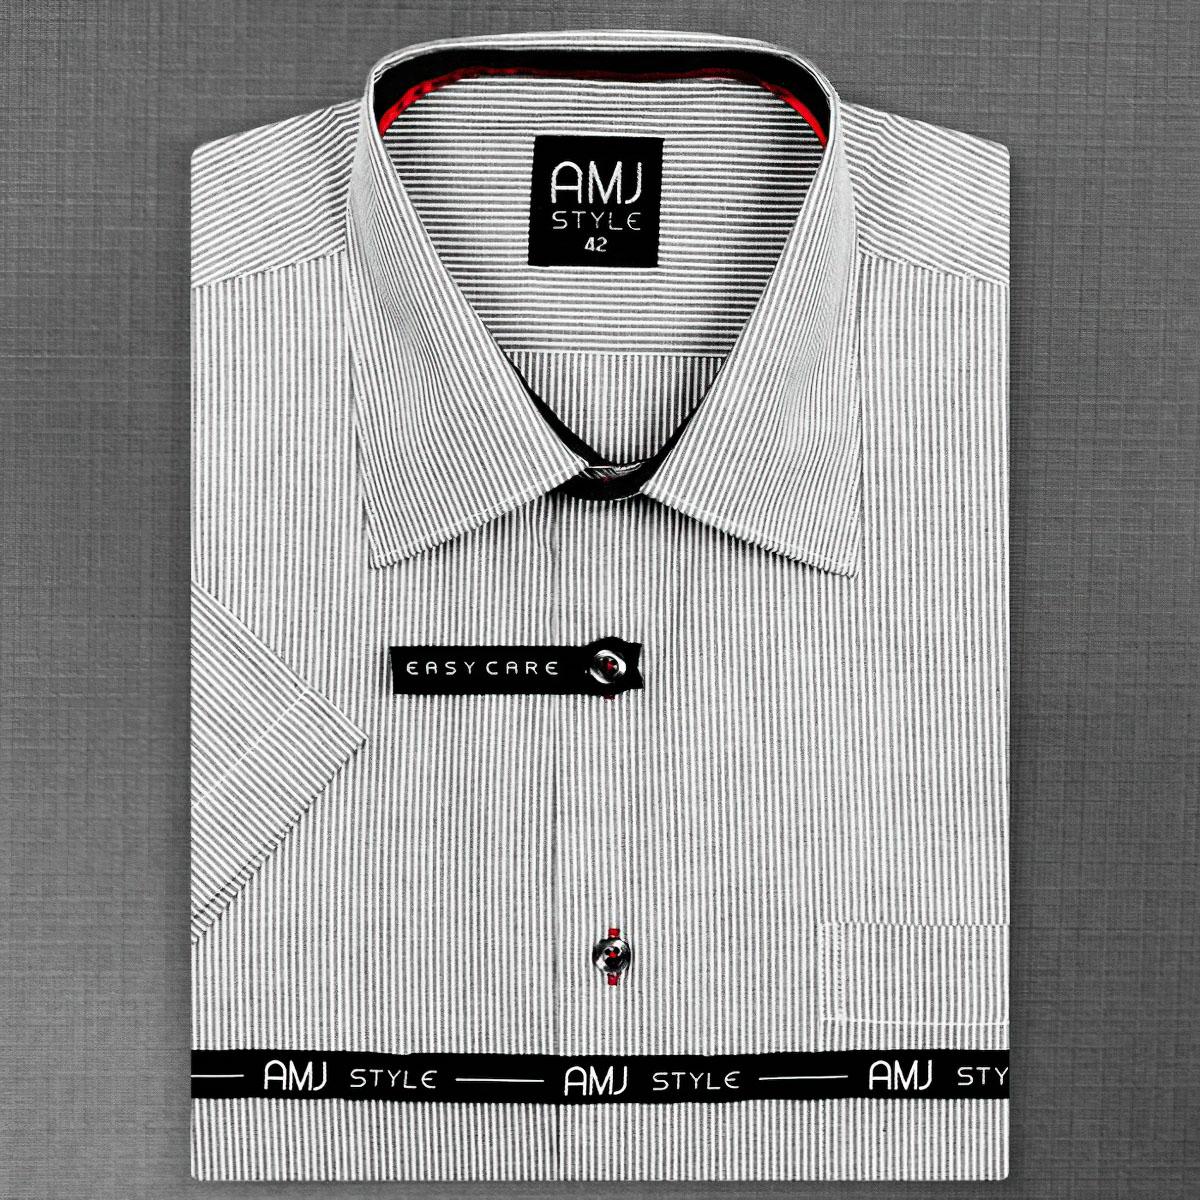 Pánská košile AMJ vzorovaná VKR648, krátký rukáv